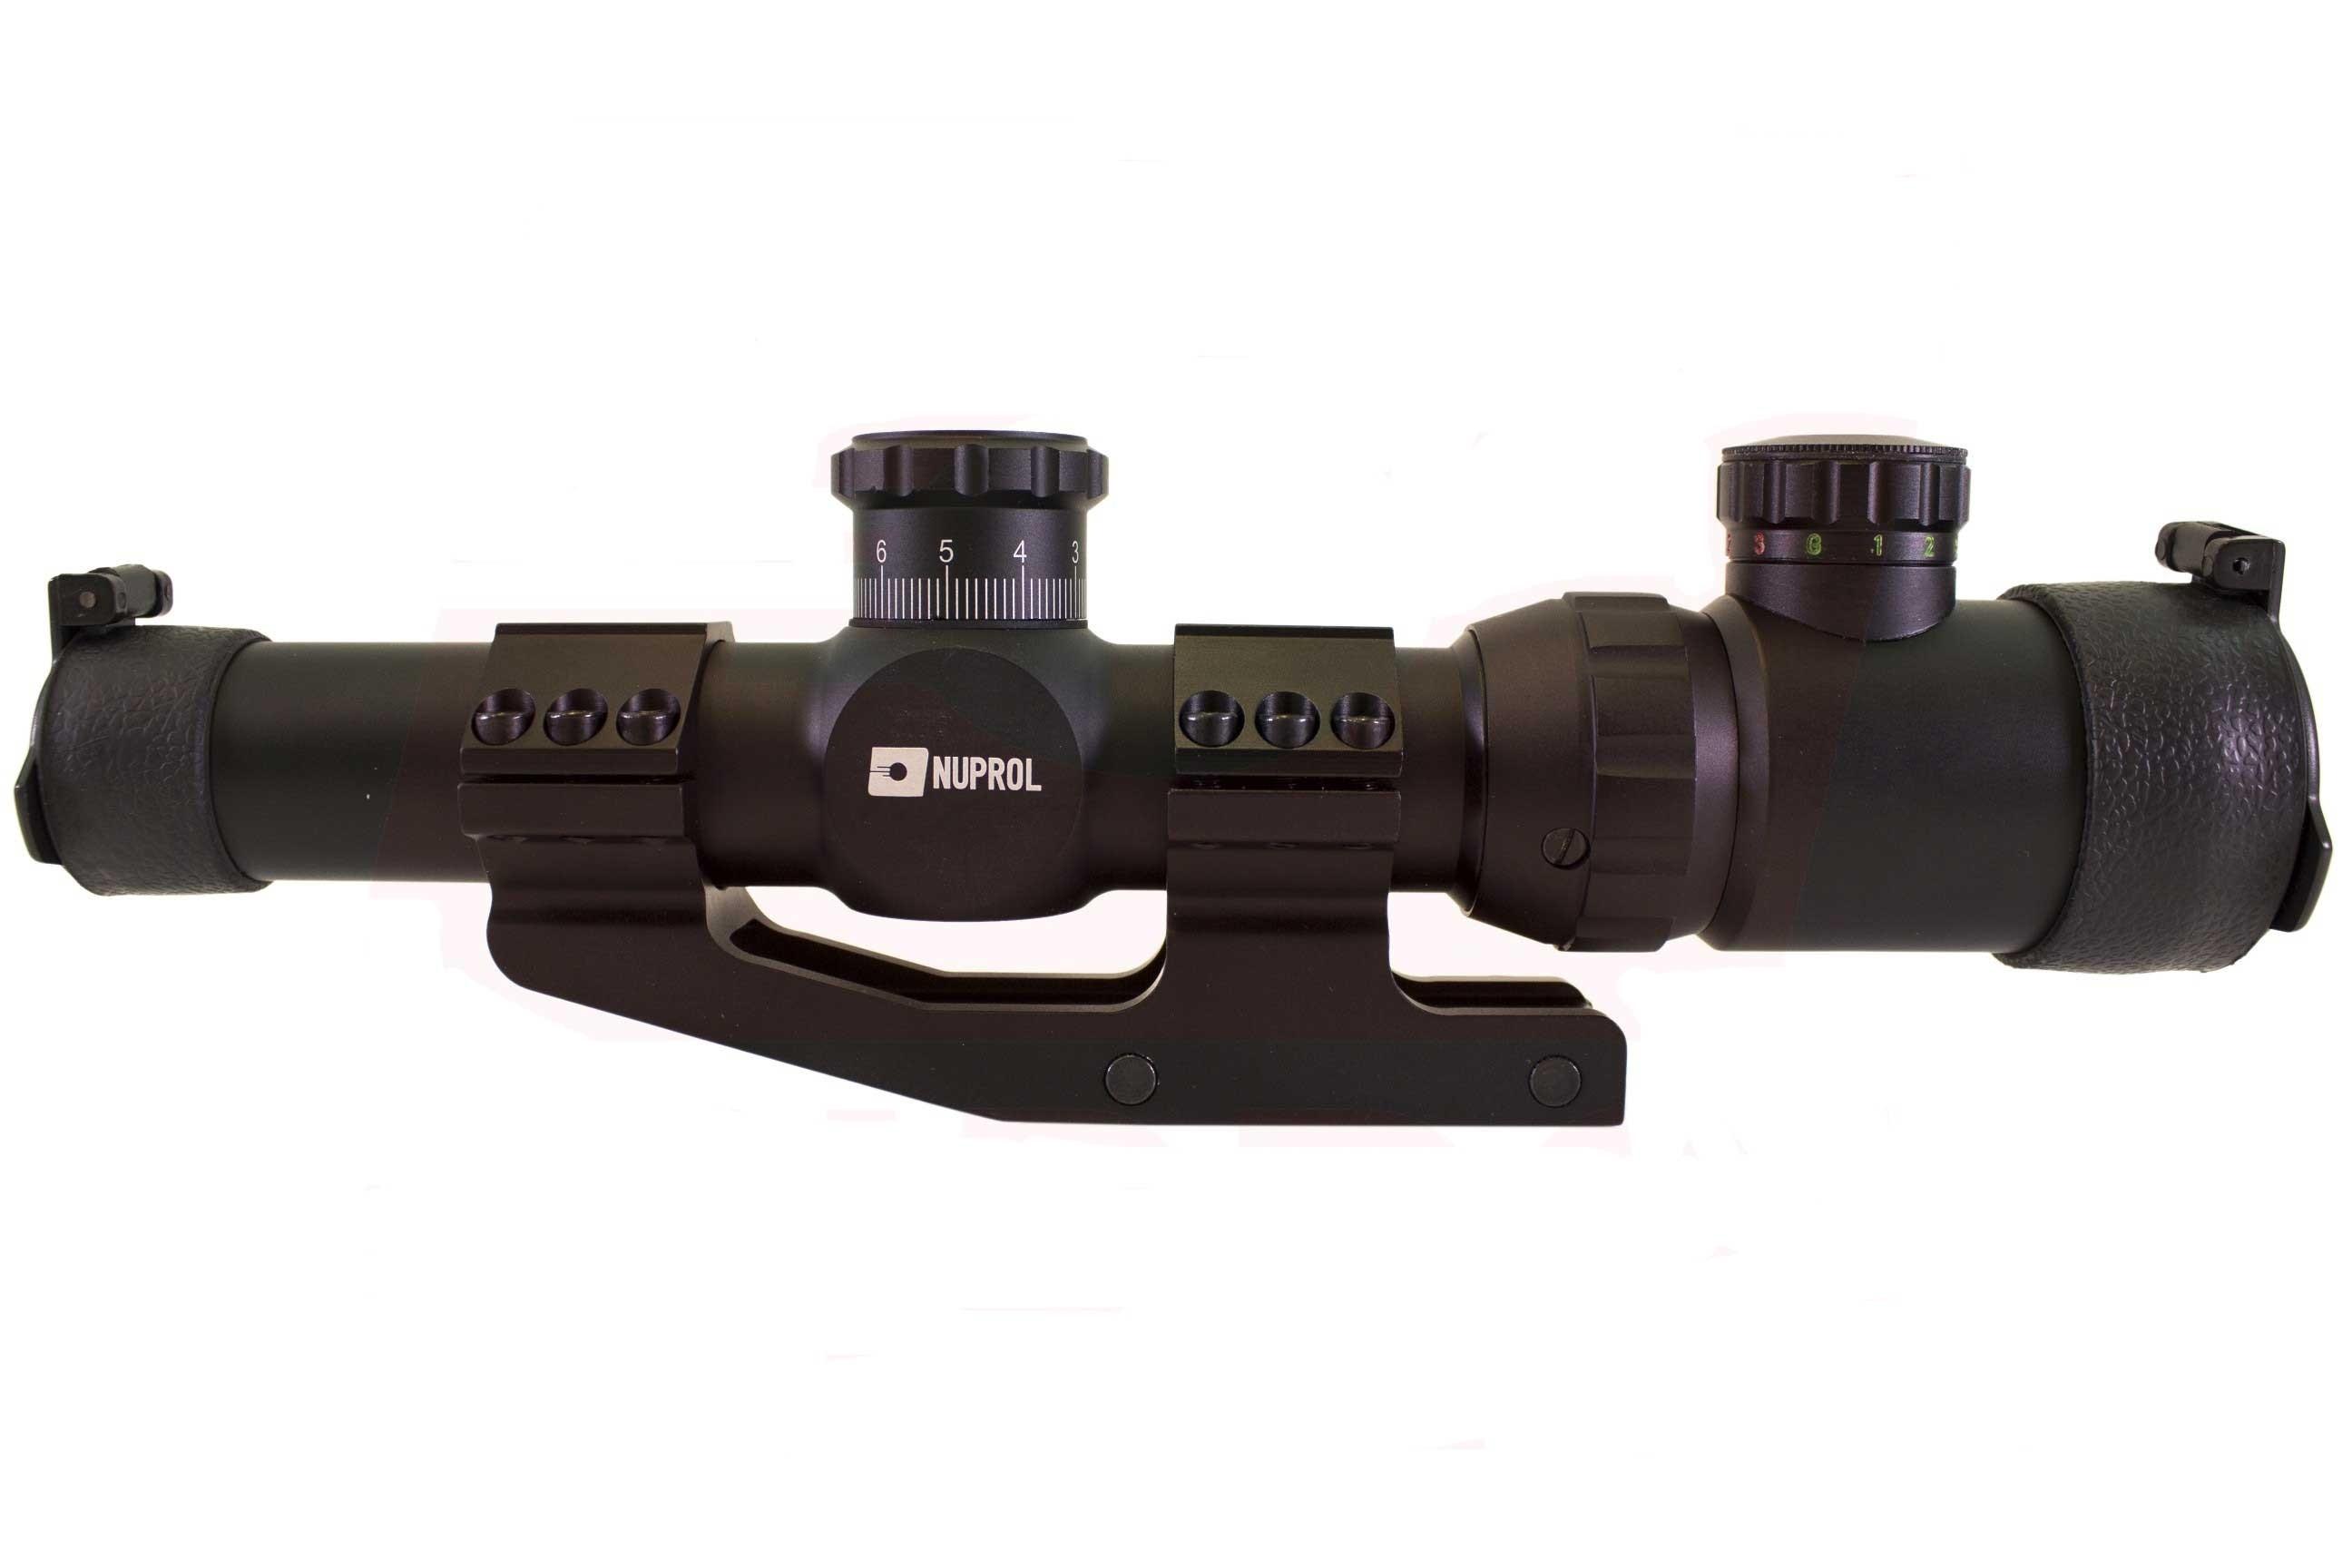 Nuprol Optics - 1.25-5x26 IR - Black